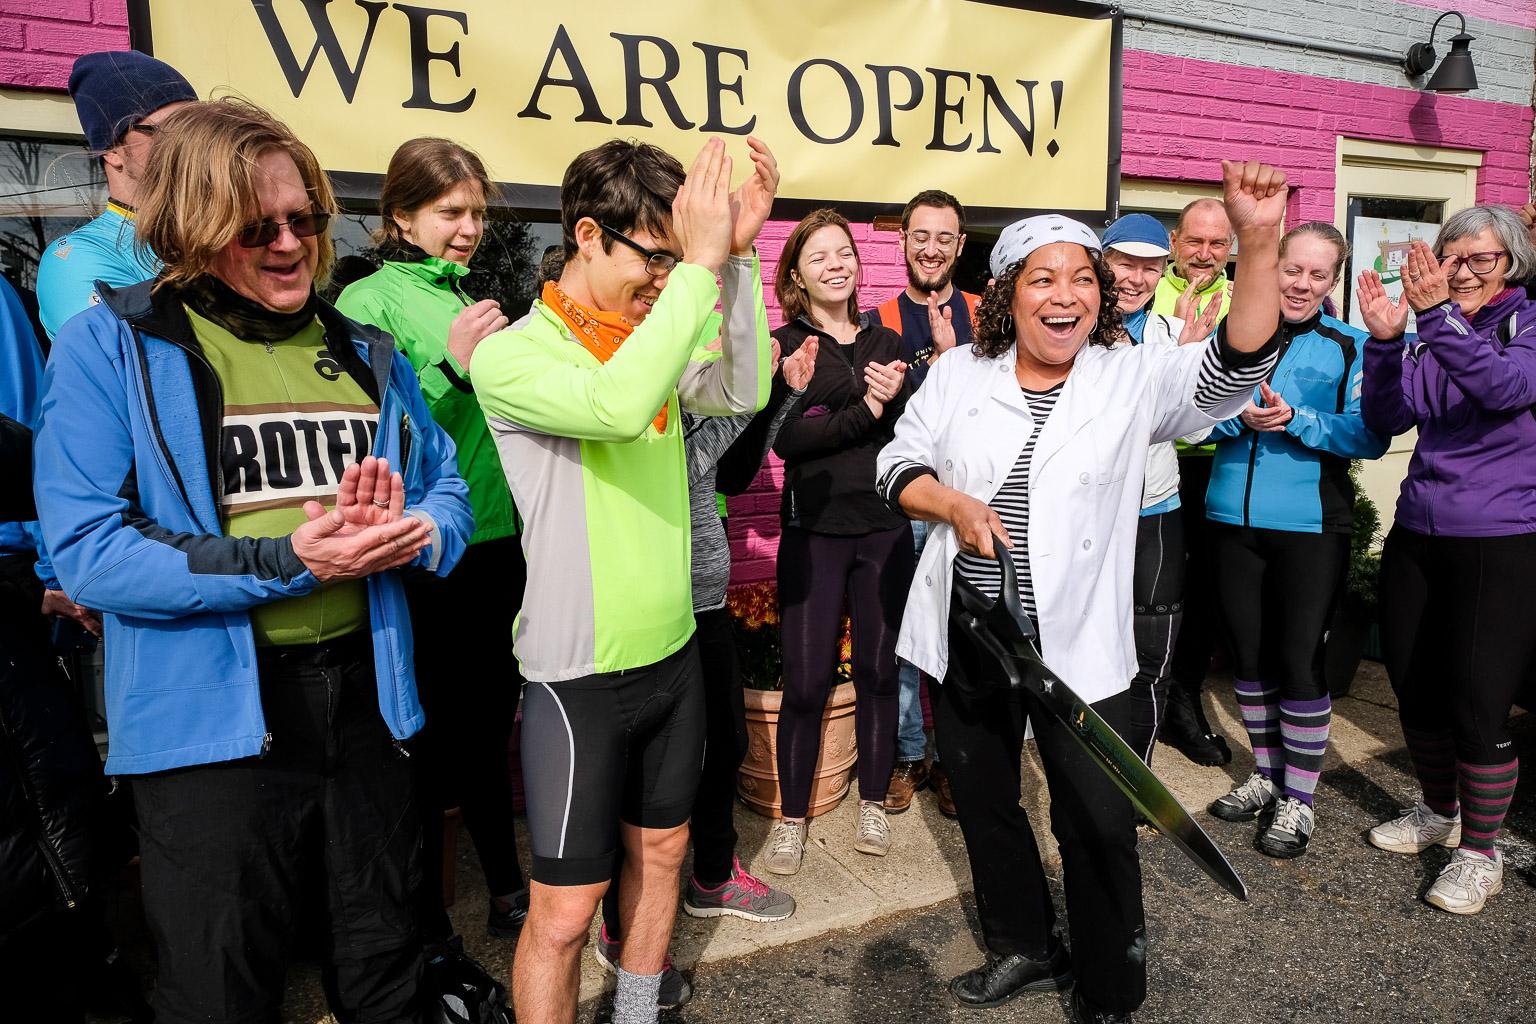 Shortcake_Reopening_11-18-17-048-Lenzy-Ruffin-Event-Photography-Washington-DC-Fuji-X-T2.jpg